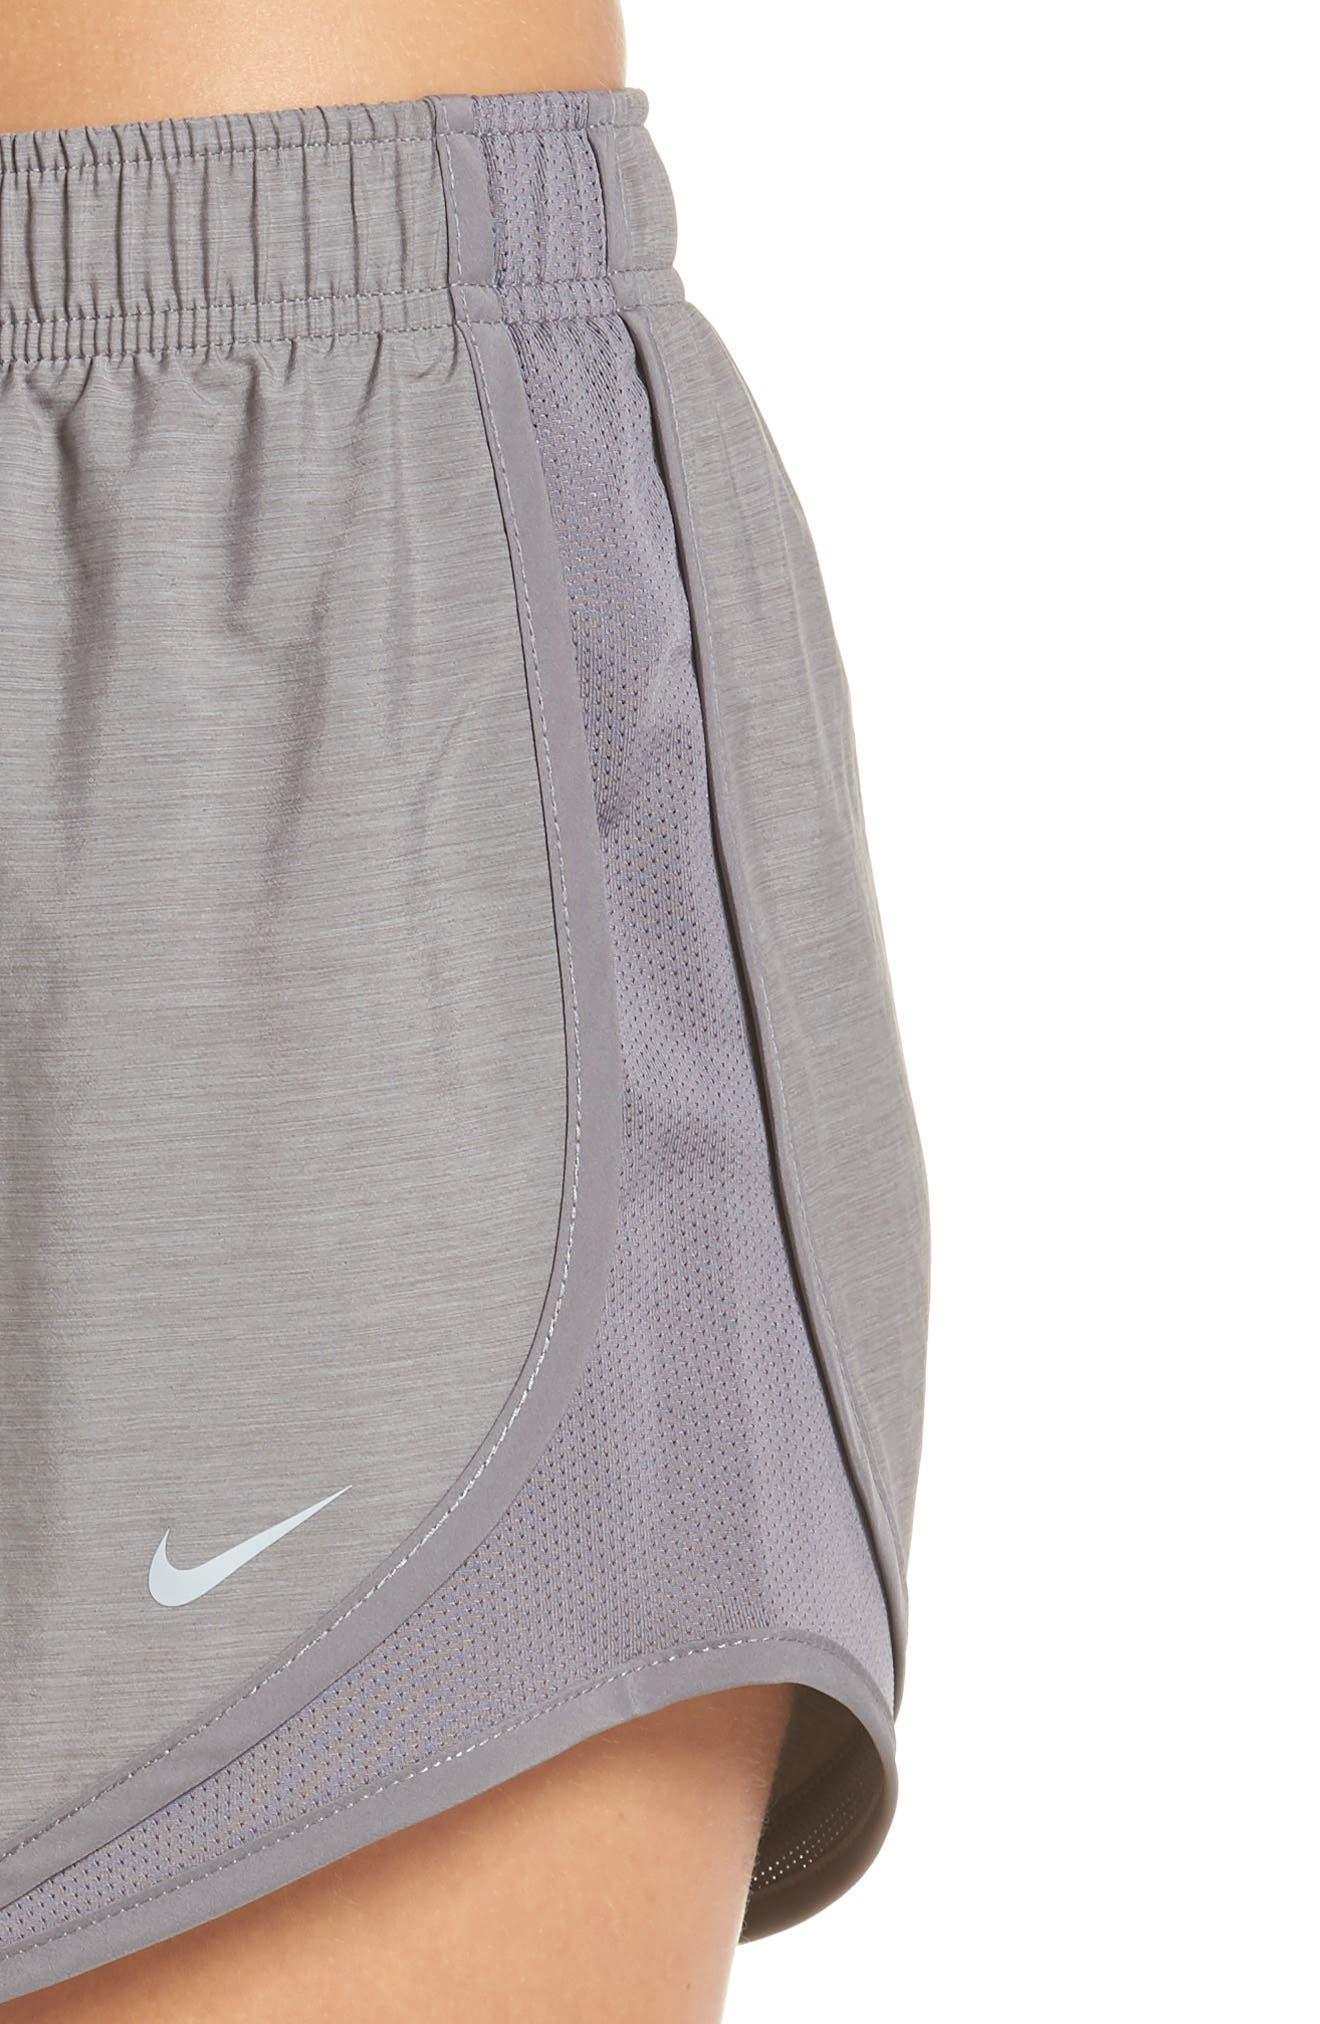 Dry Tempo Running Shorts,                             Alternate thumbnail 4, color,                             GUNSMOKE/ WOLF GREY